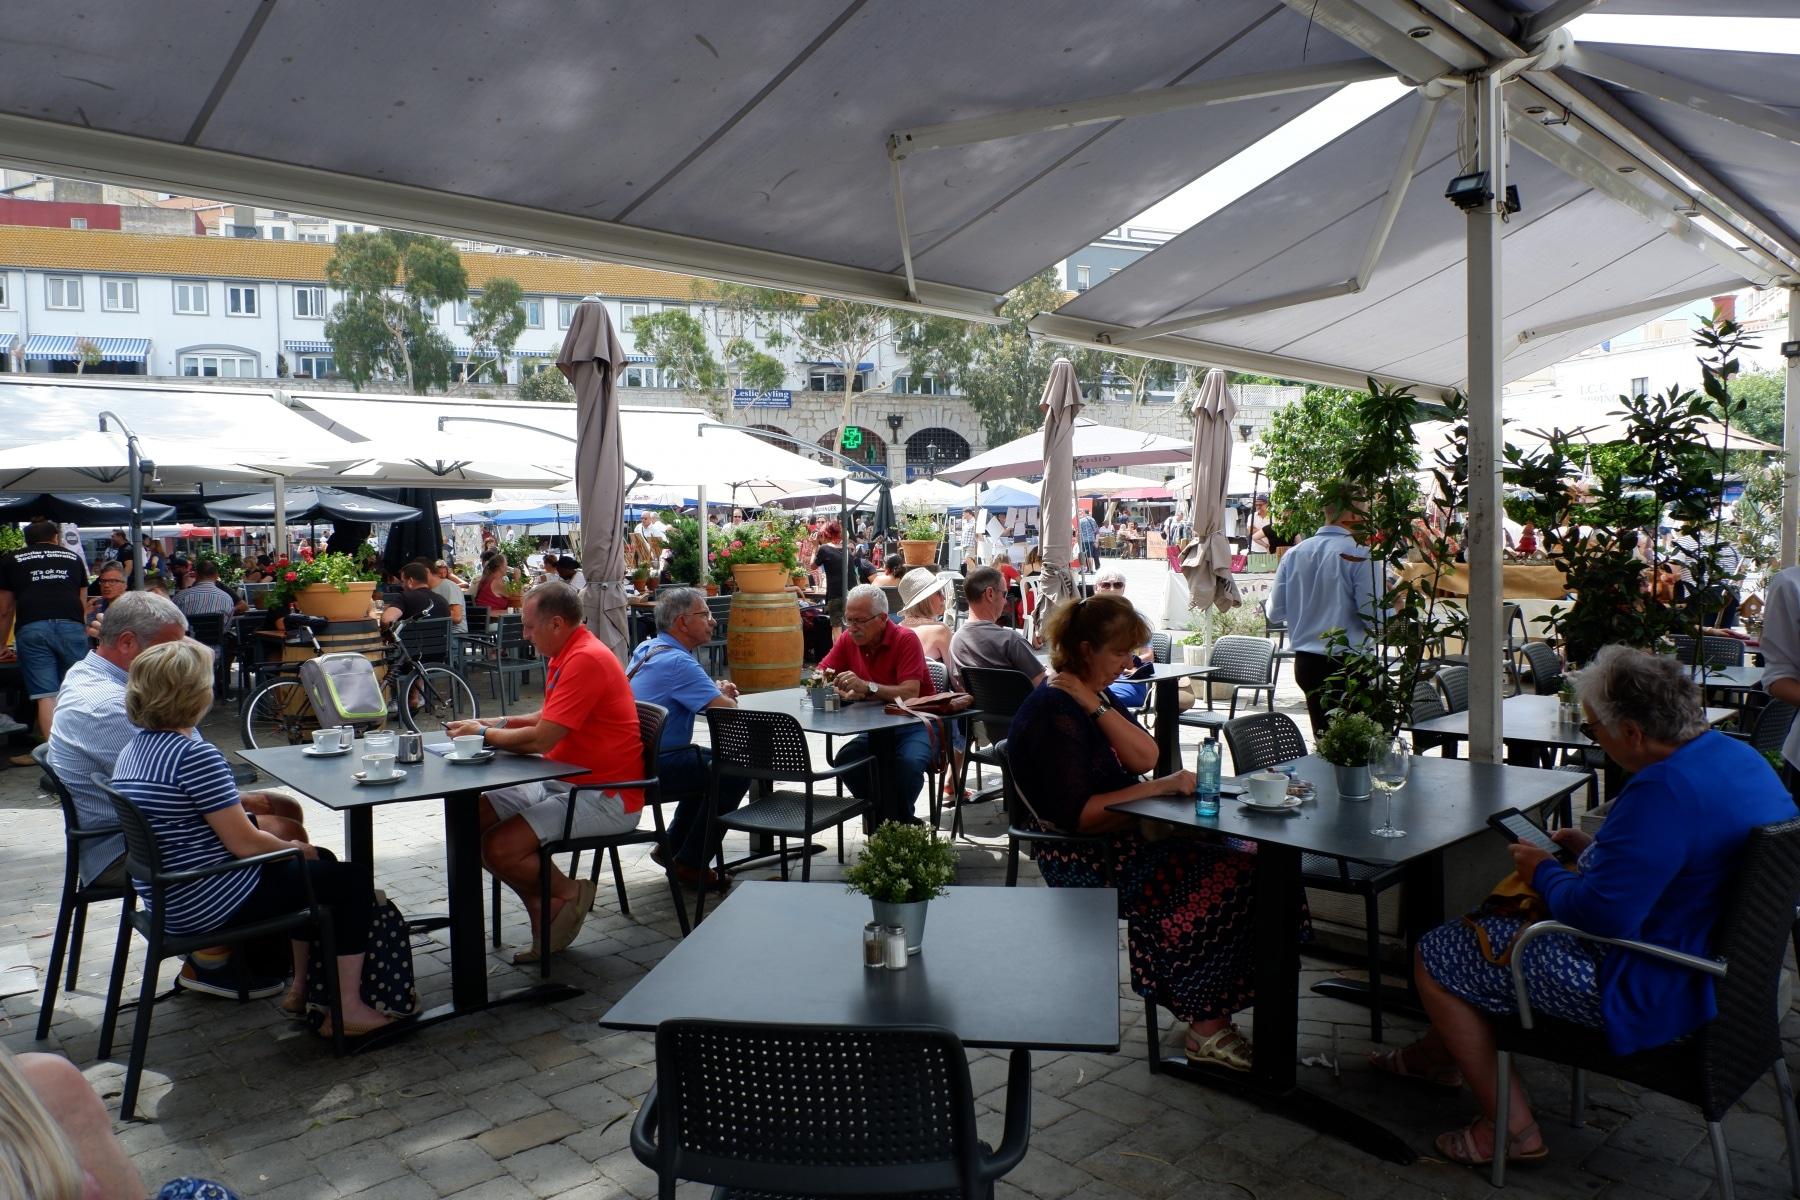 23-jun-2019-blogueros-espaoles-de-viajes-visitan-el-pen_48131072316_o